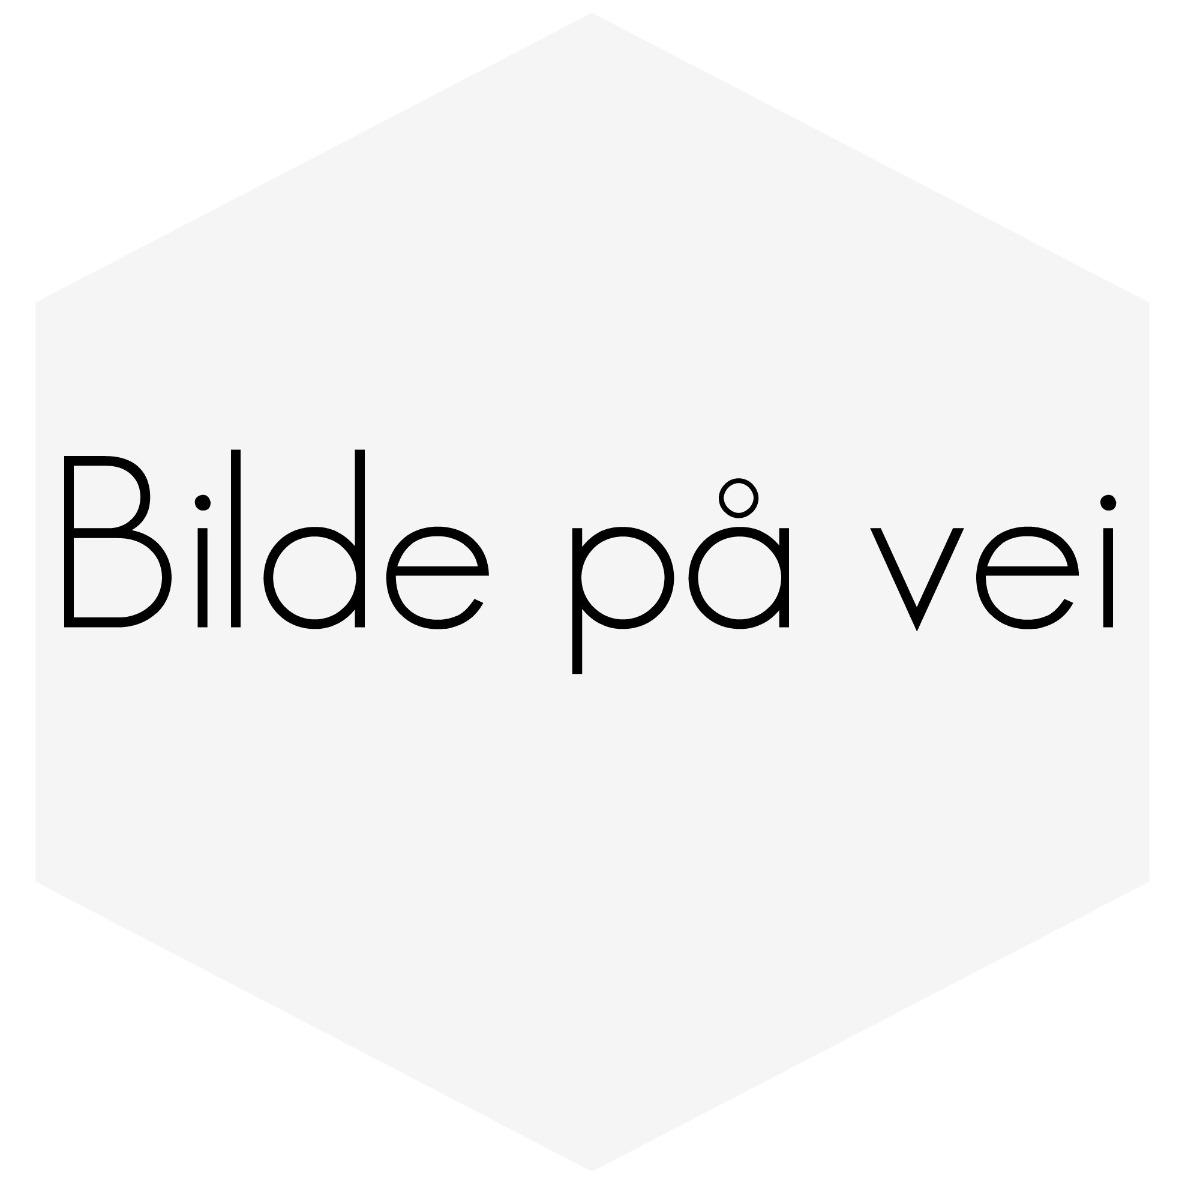 "SILIKONSLANGE RØD REDUSERING 2,75-3,125"" (70-80MM)"